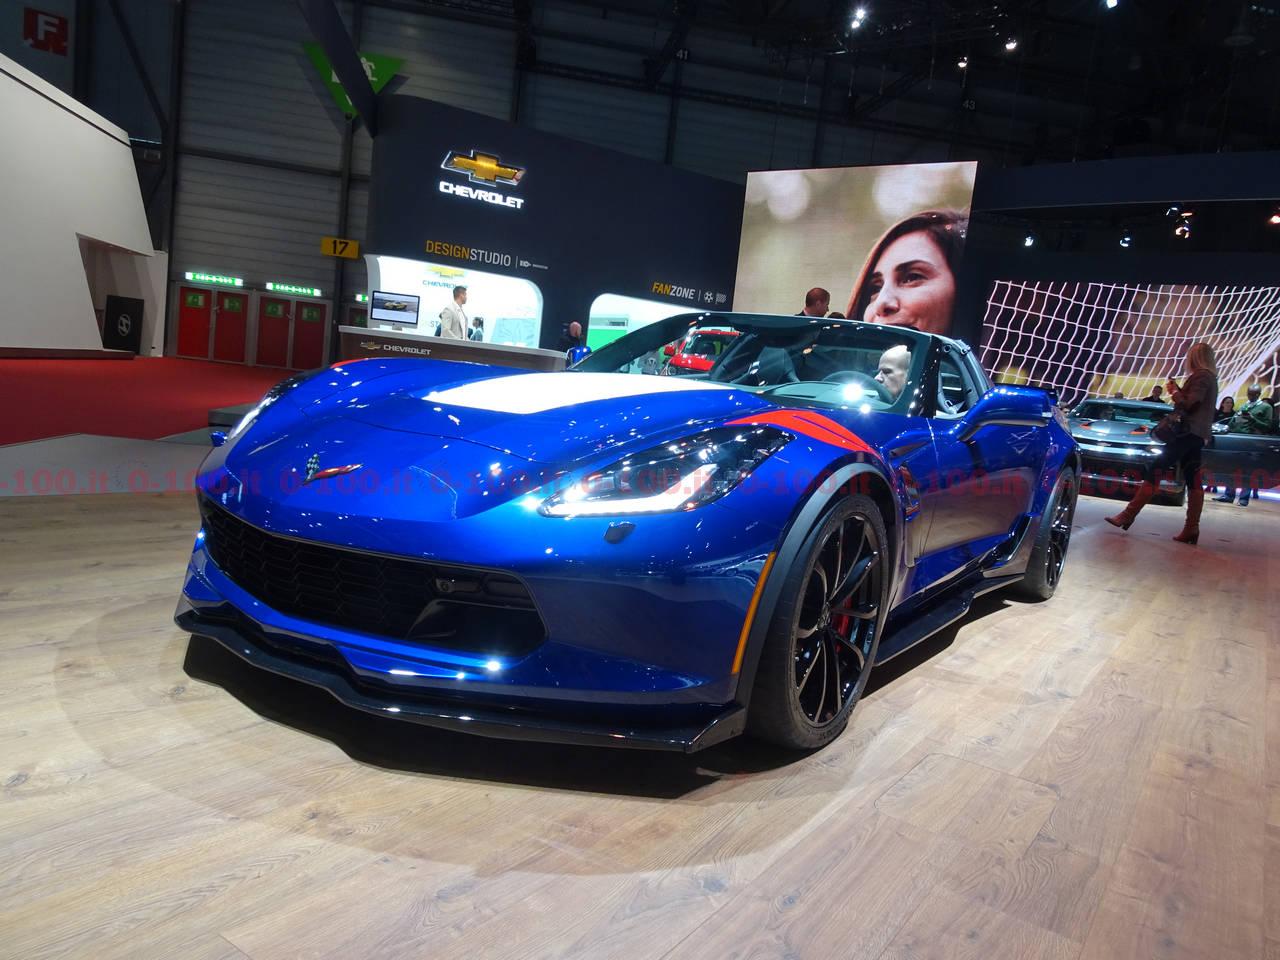 Ginevra-geneva-geneve-2017-Chevrolet-corvette-0-100_13